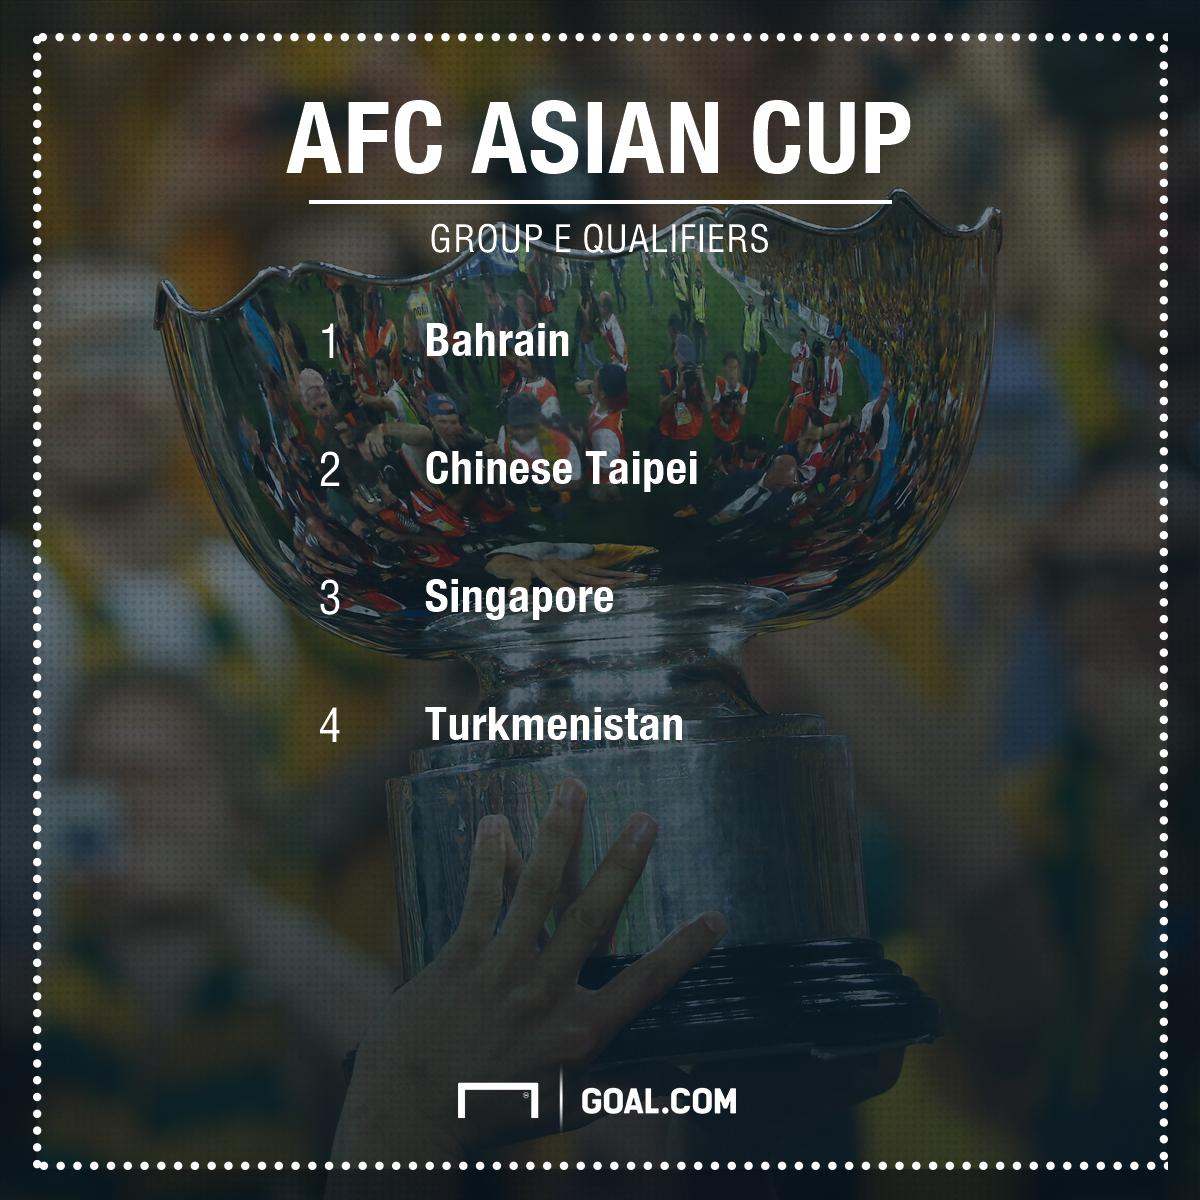 AFC Asian Cup qualifiers Group E GFX